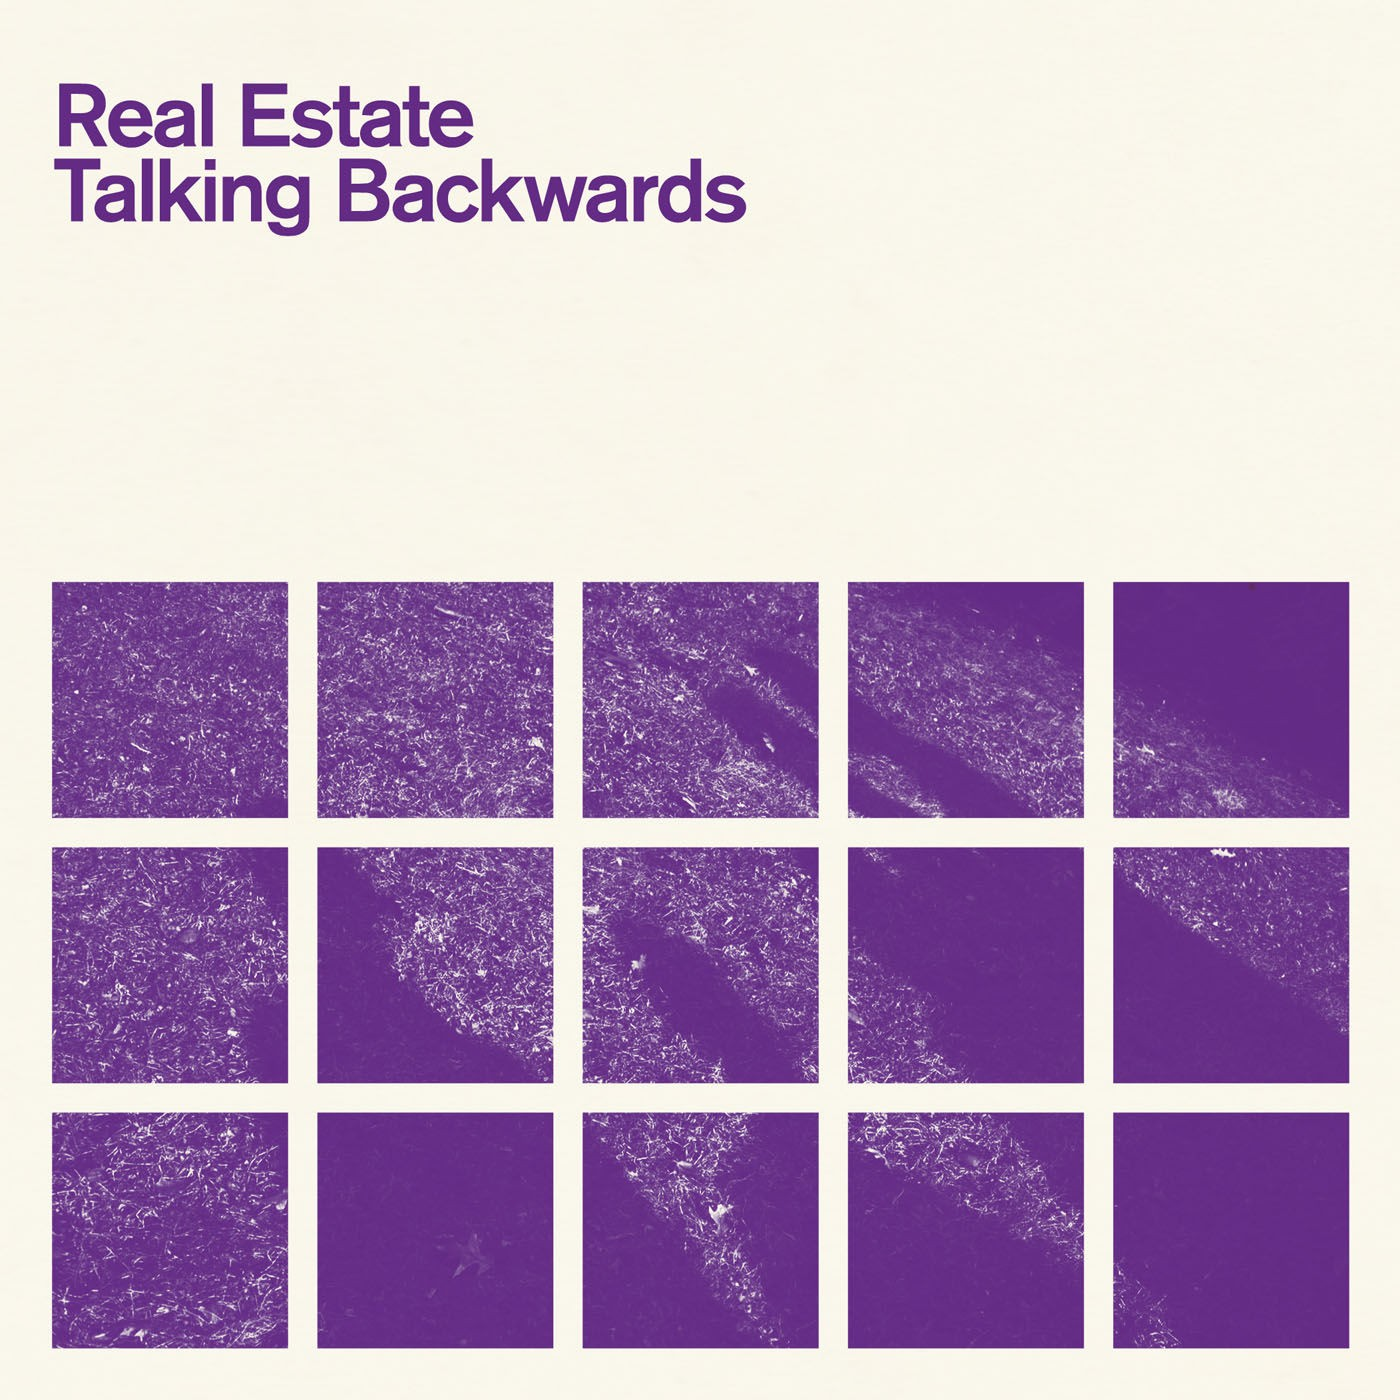 Real Estate - Talking Backwards EP